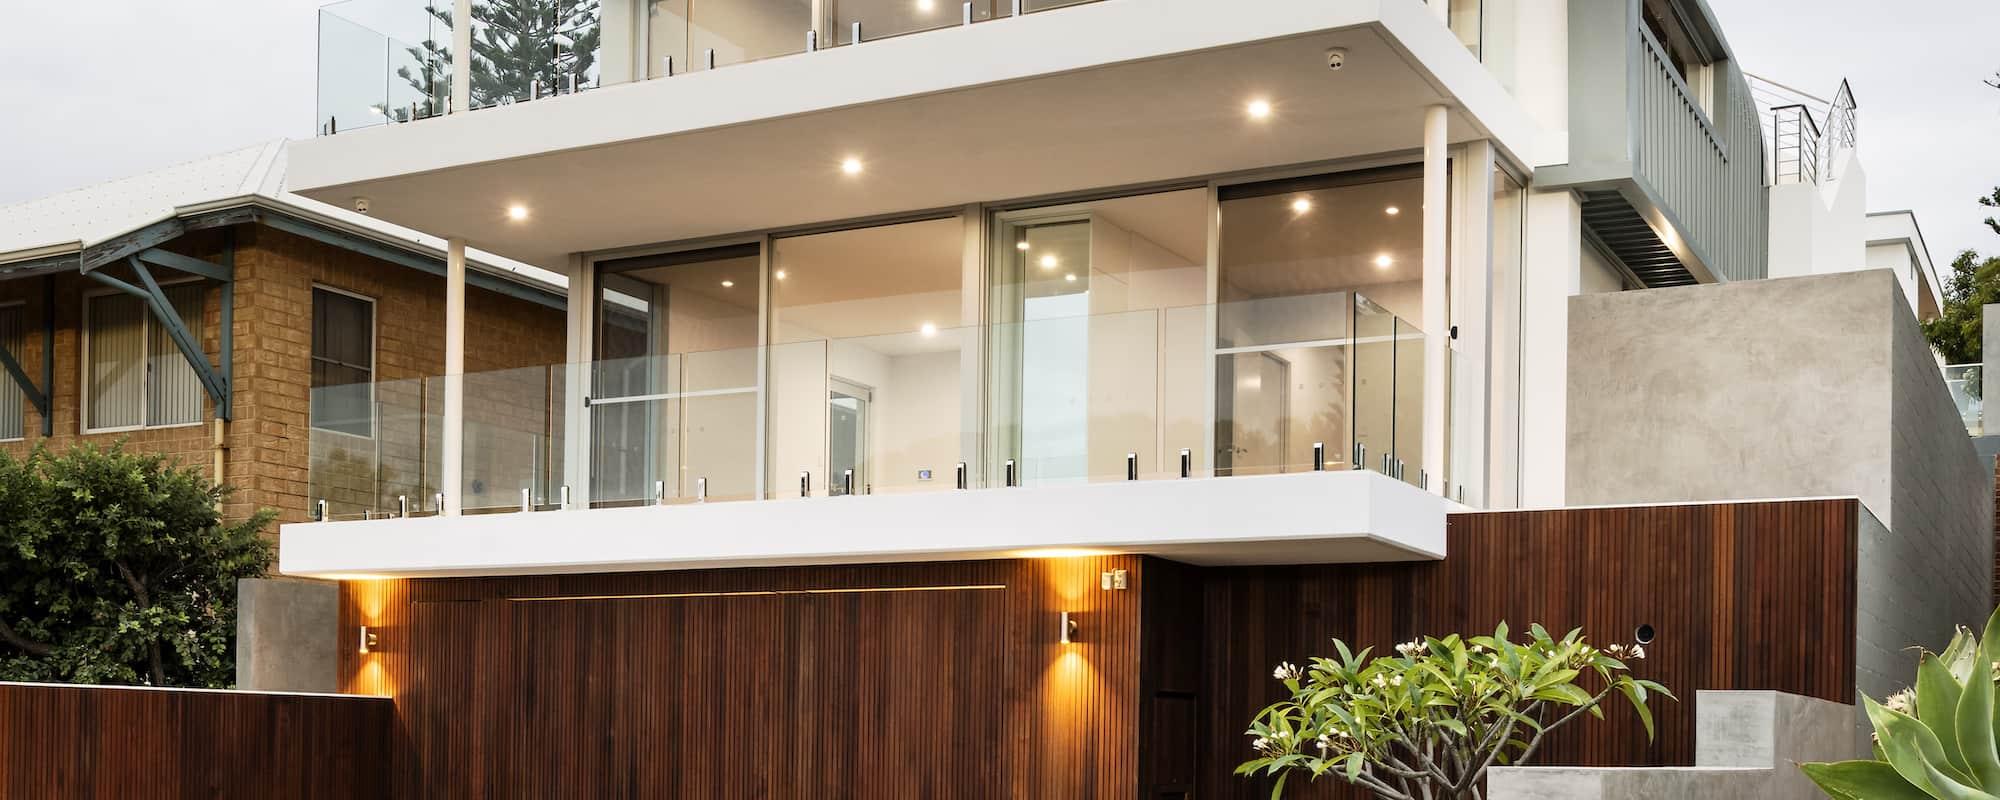 Custom Home Builder Perth